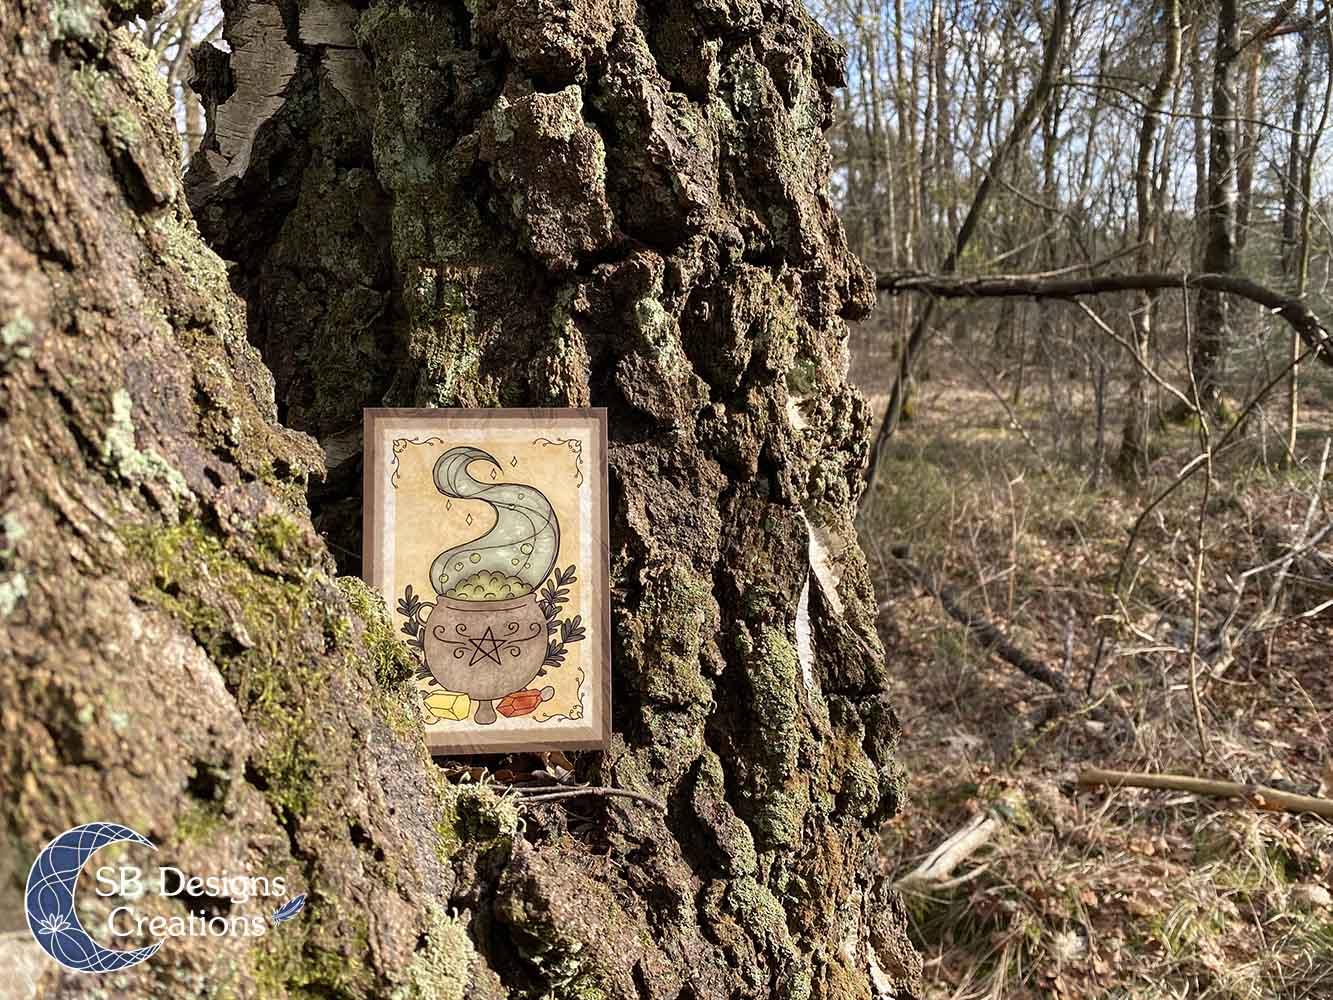 Heksenketel-Heks-Kunst-Artprint-Pagan-Art-Witch-Home